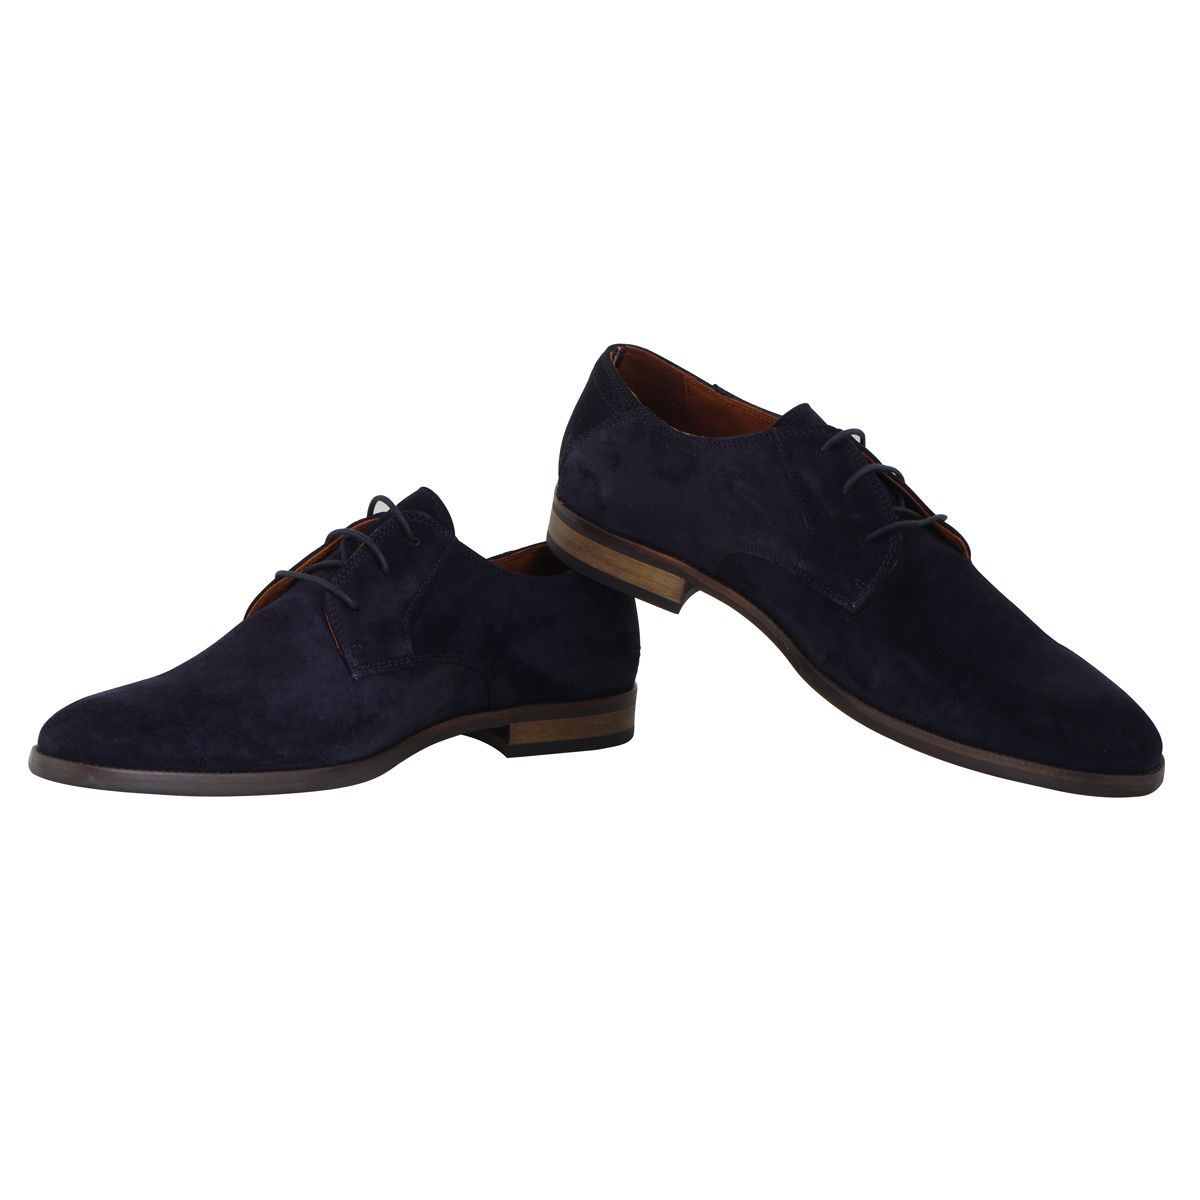 chaussures bleues grande taille du 46 au 48 size factory tommy hilfiger. Black Bedroom Furniture Sets. Home Design Ideas